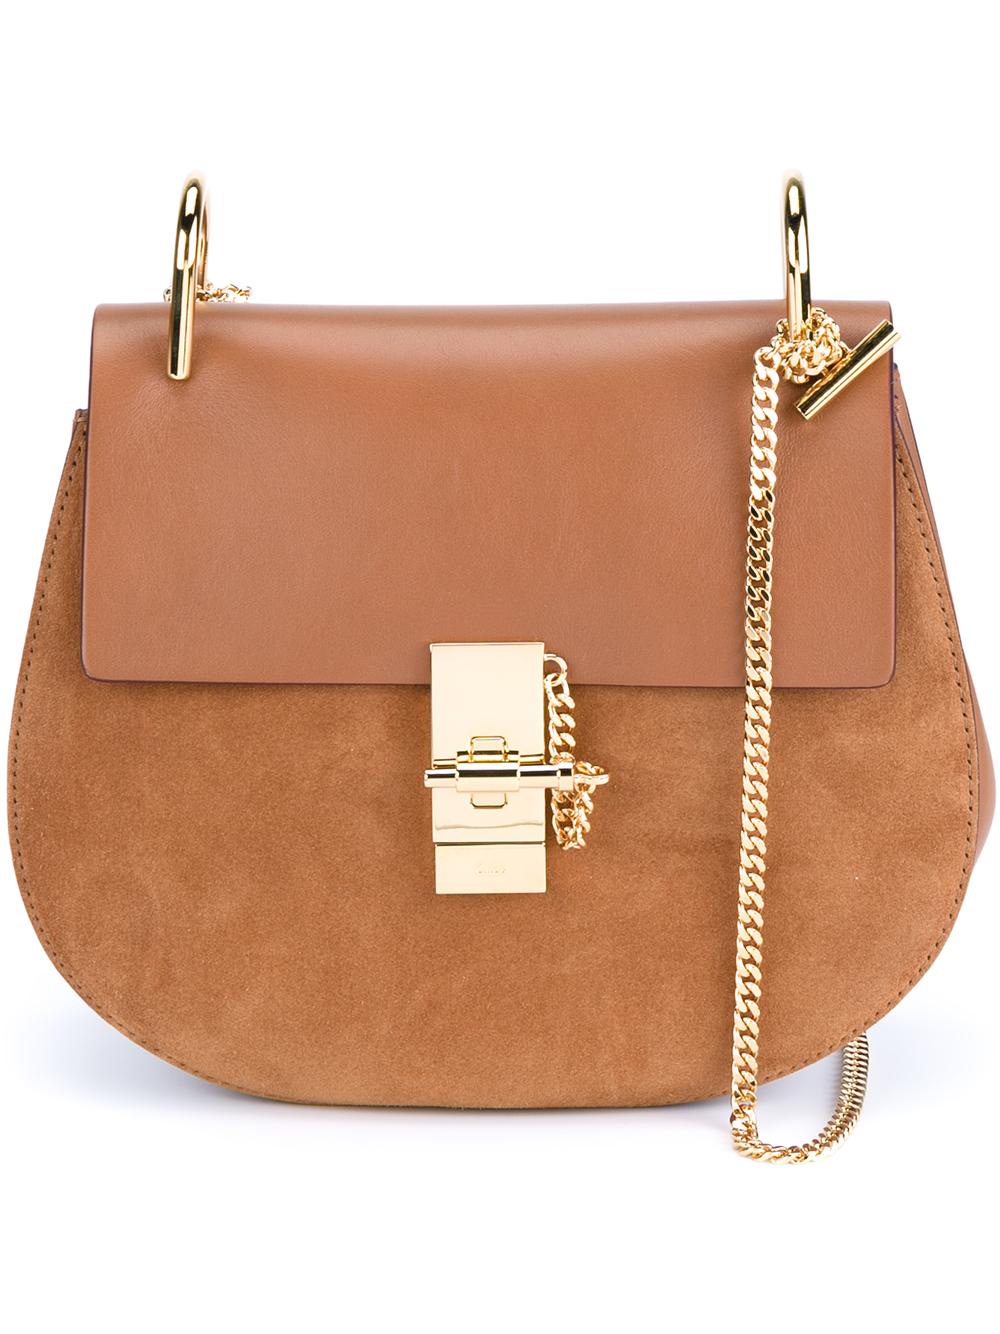 chloe marcie knockoff - Chlo�� Small Leather Drew Bag in Brown (CARAMEL) | Lyst